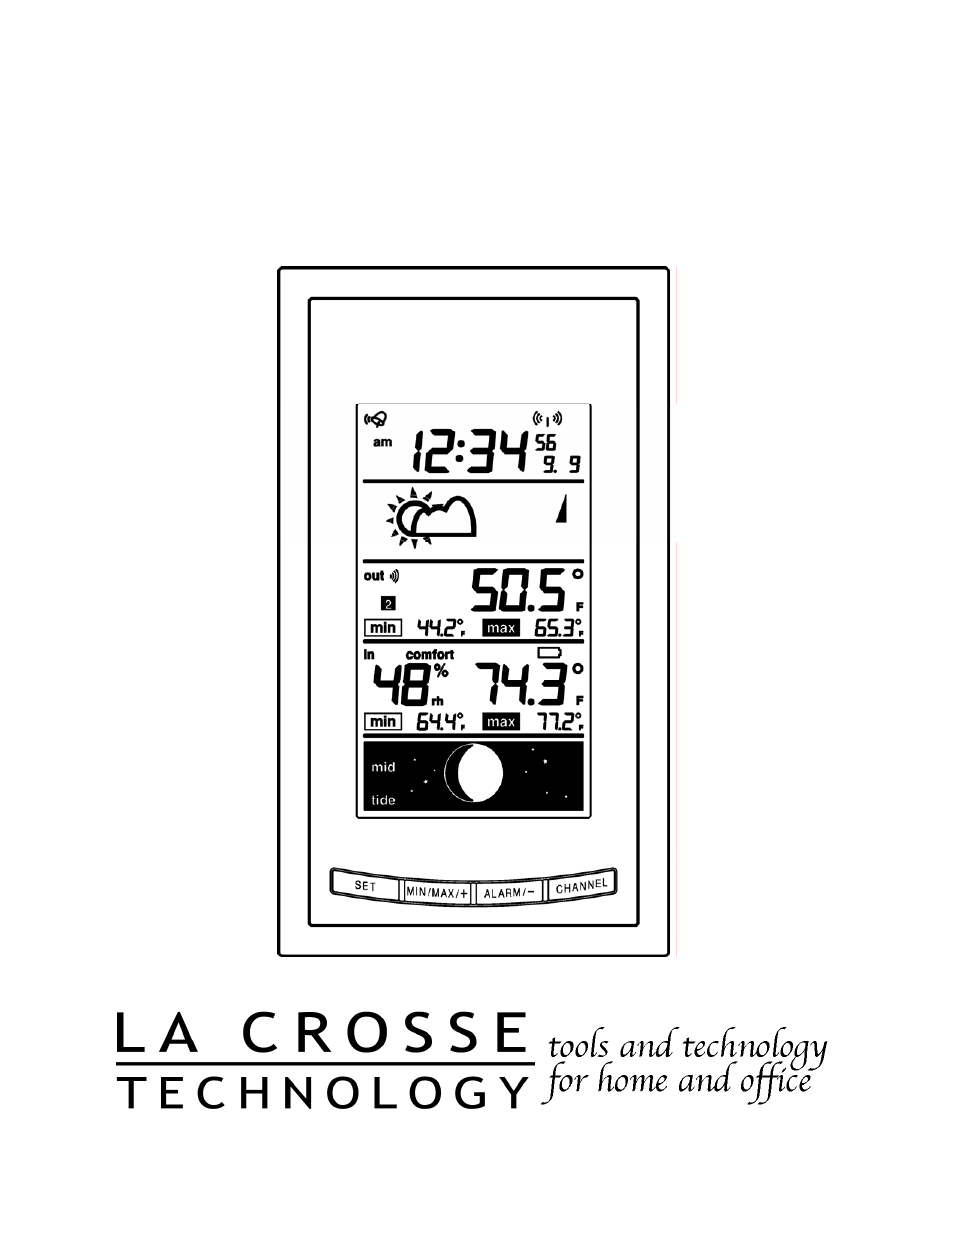 la crosse technology ws 9075u user manual 45 pages also for rh manualsdir com La Crosse Thermometer Manual la crosse technology weather station user manual